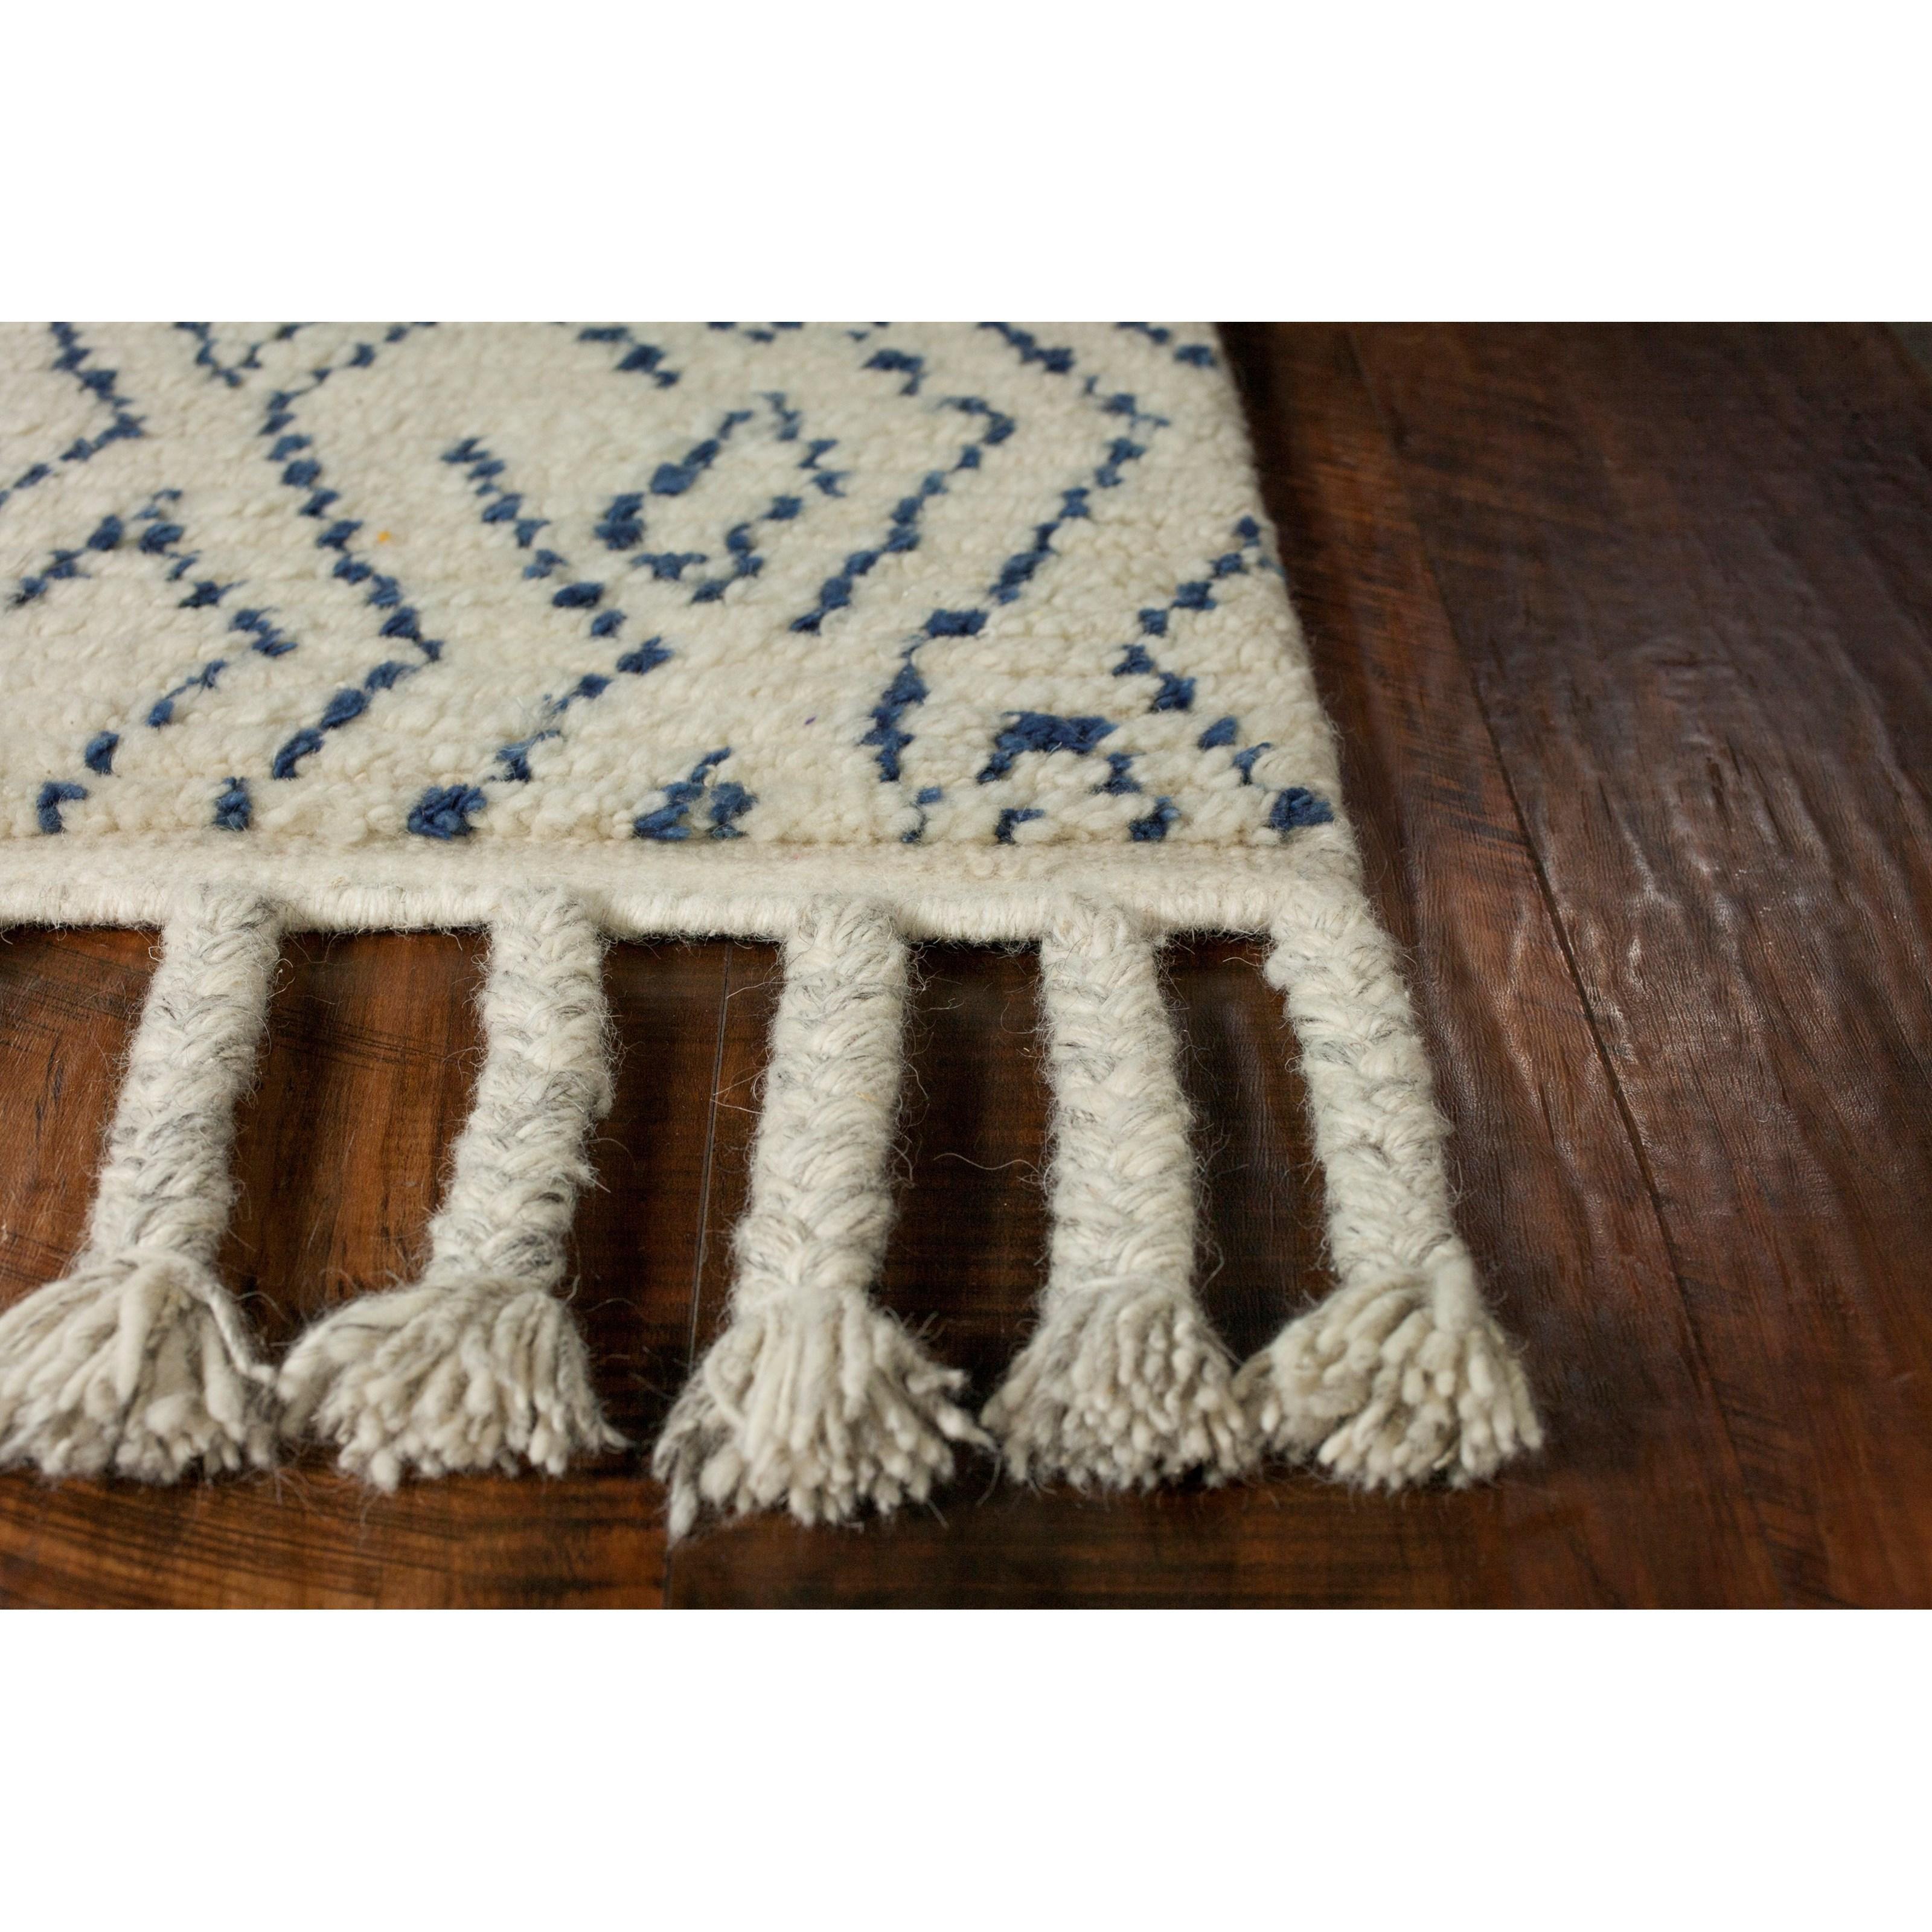 Austin 5' x 8' Ivory/Blue Mediterra Rug by Kas at Wilson's Furniture